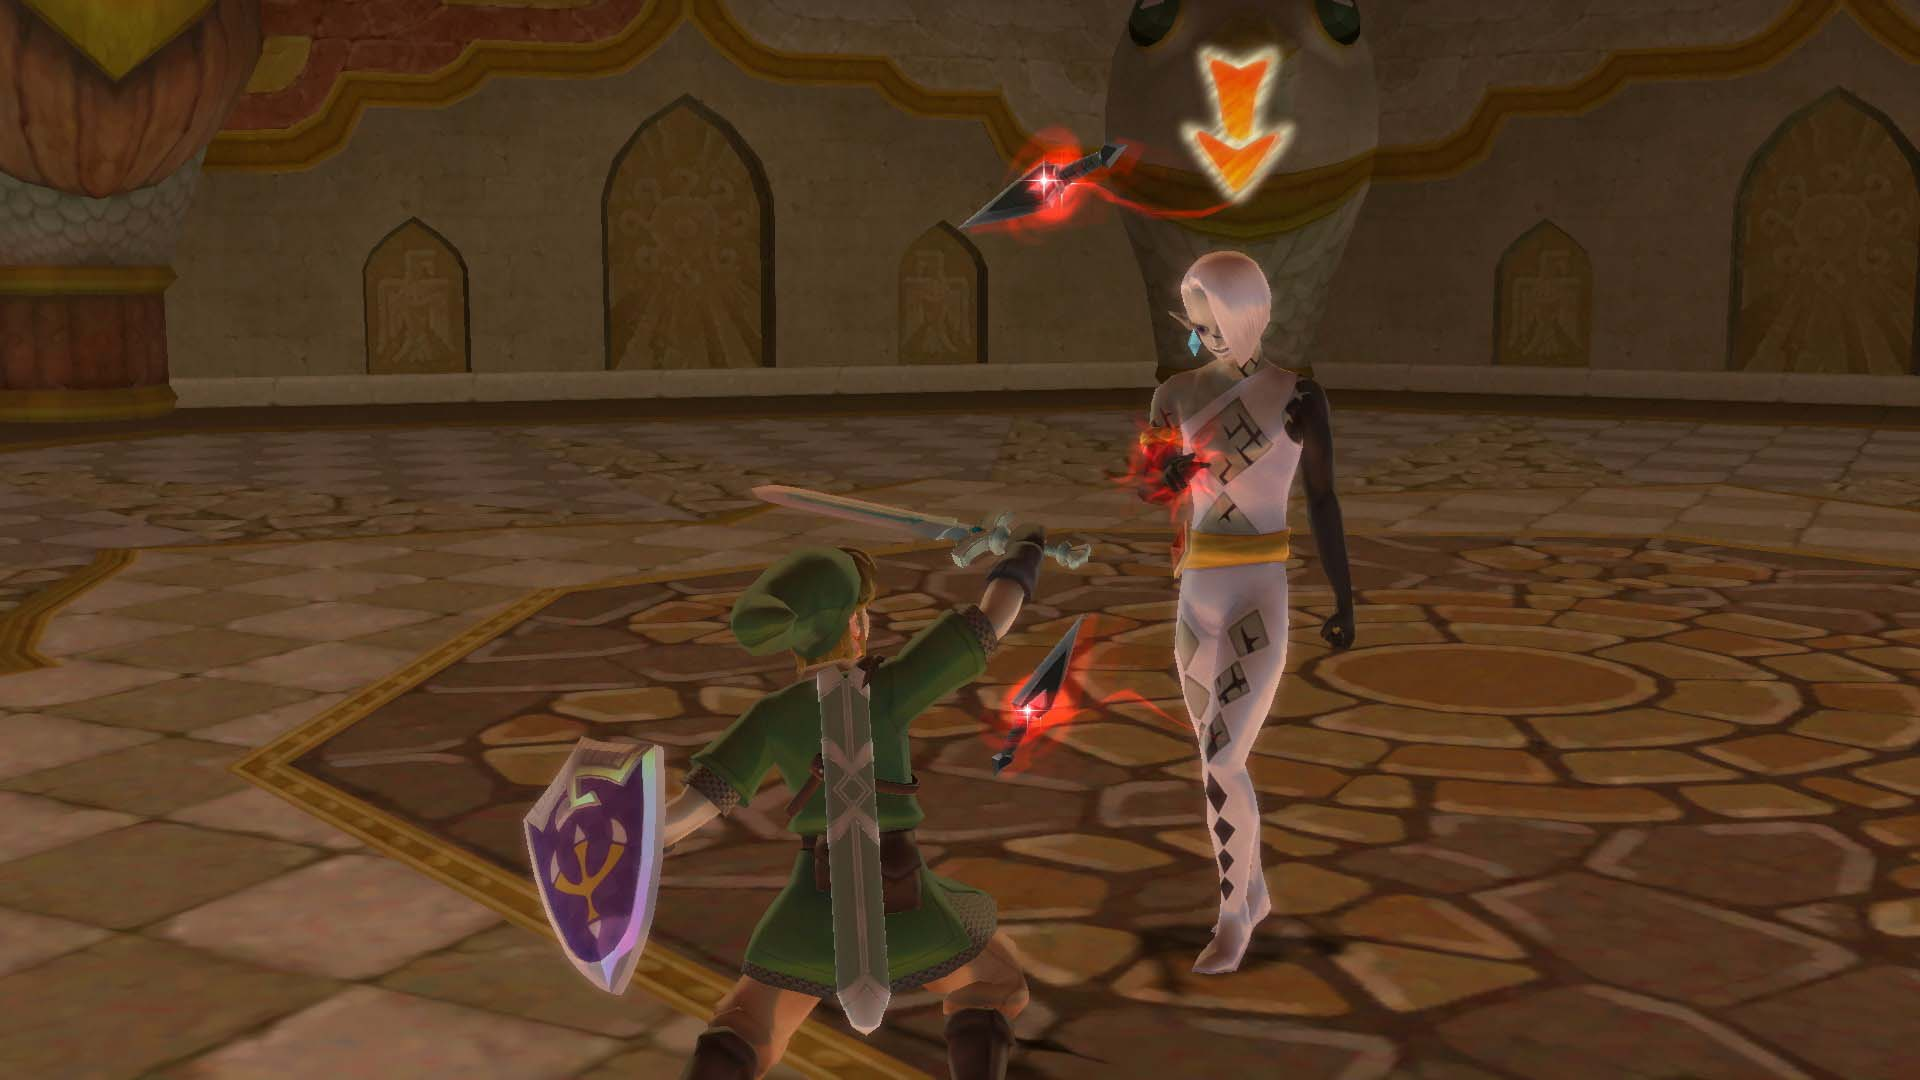 Zelda Skyward Sword screenshot